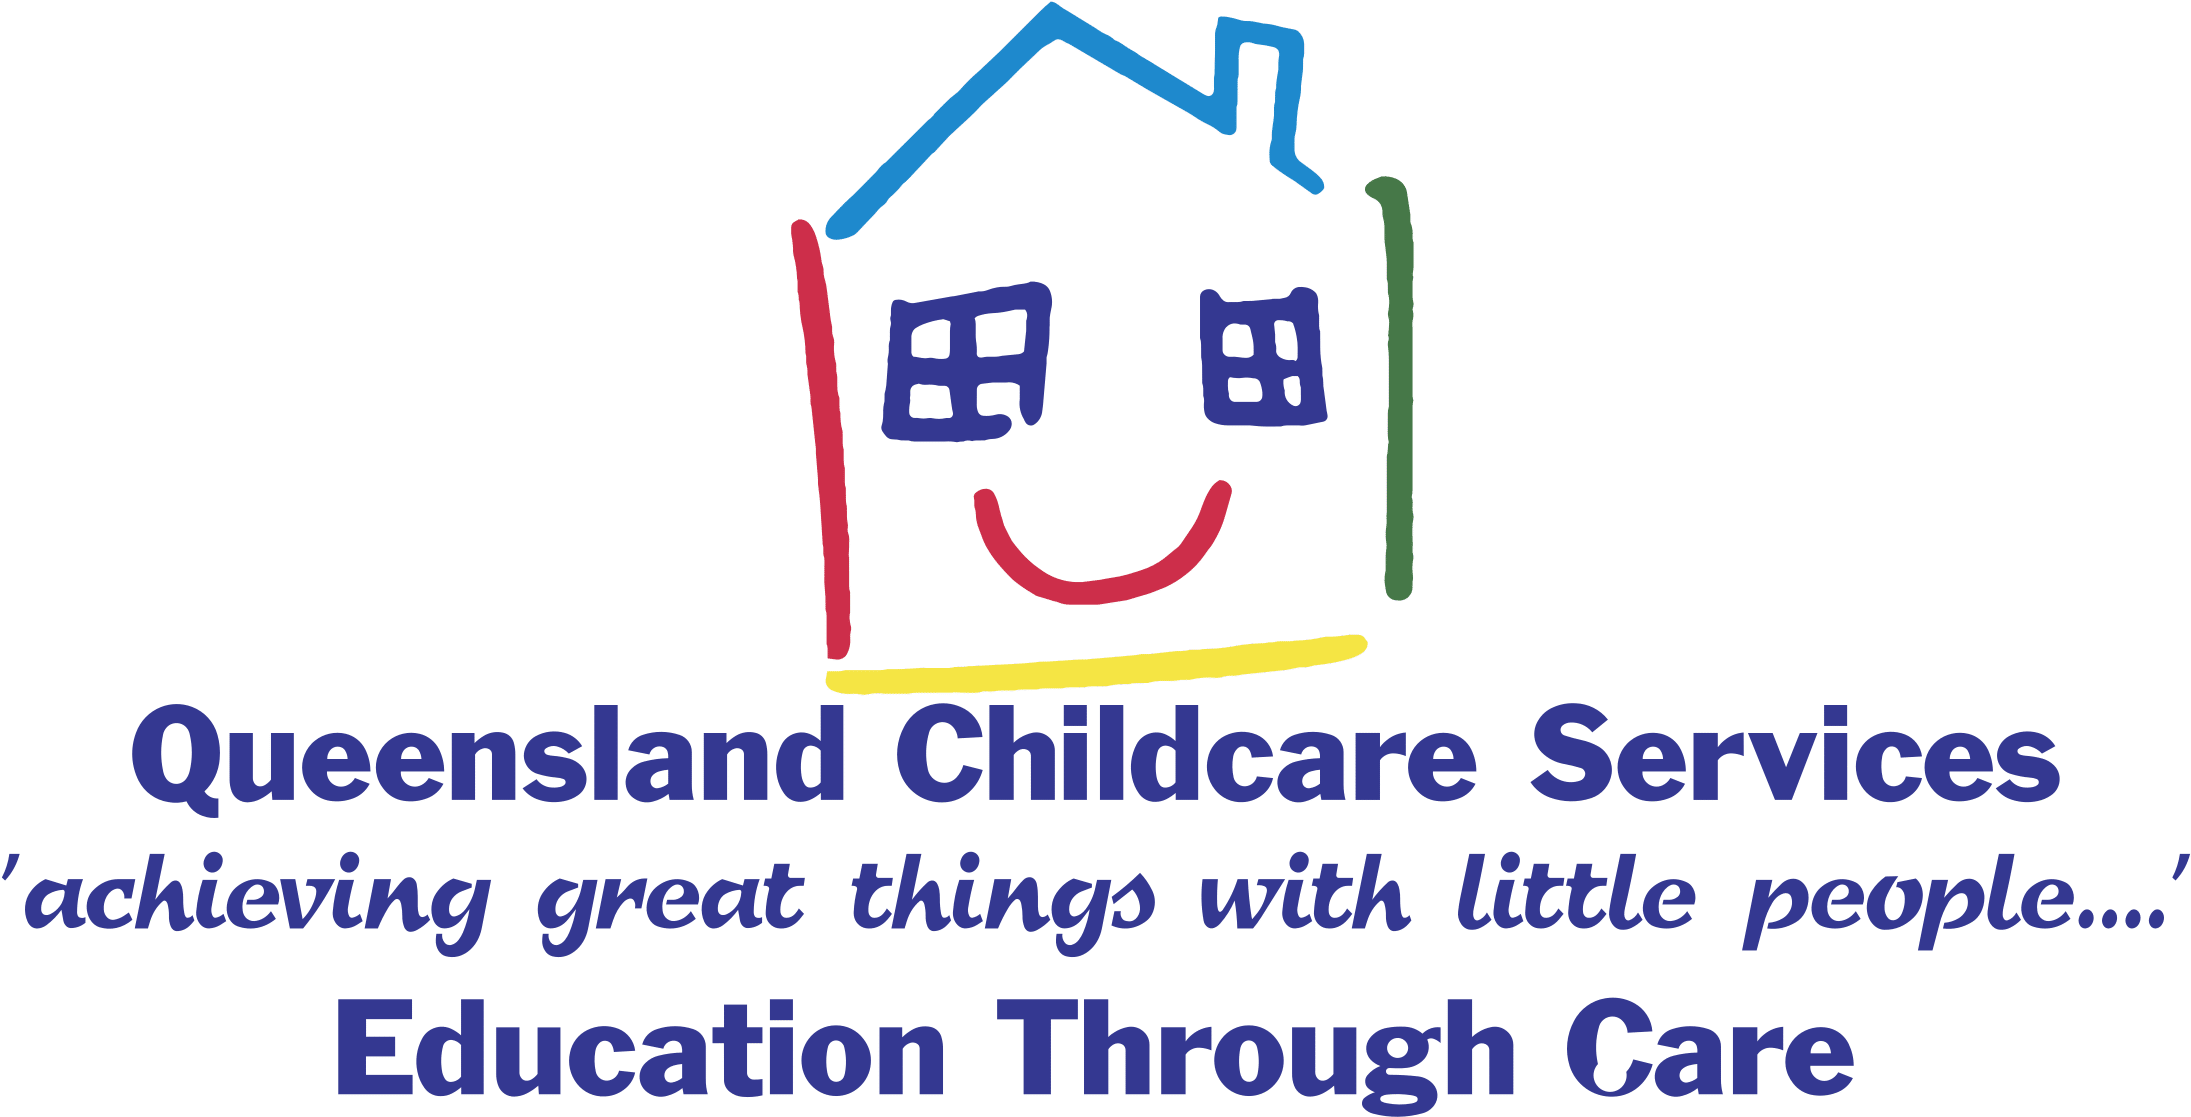 5 Queensland Childcare Services